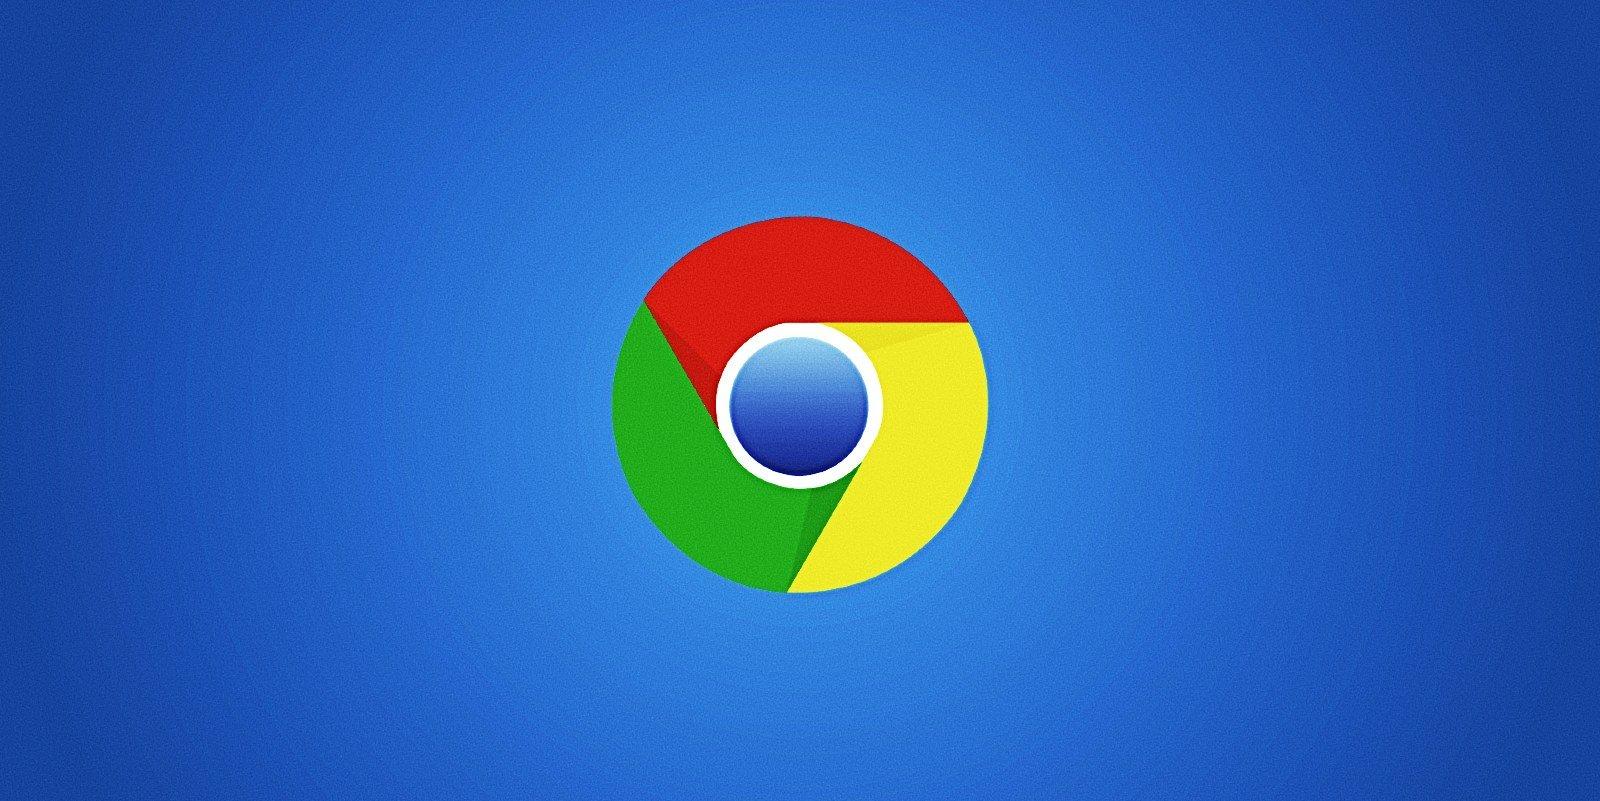 Chrome 正在获得新的渐进式 Web 应用程序功能